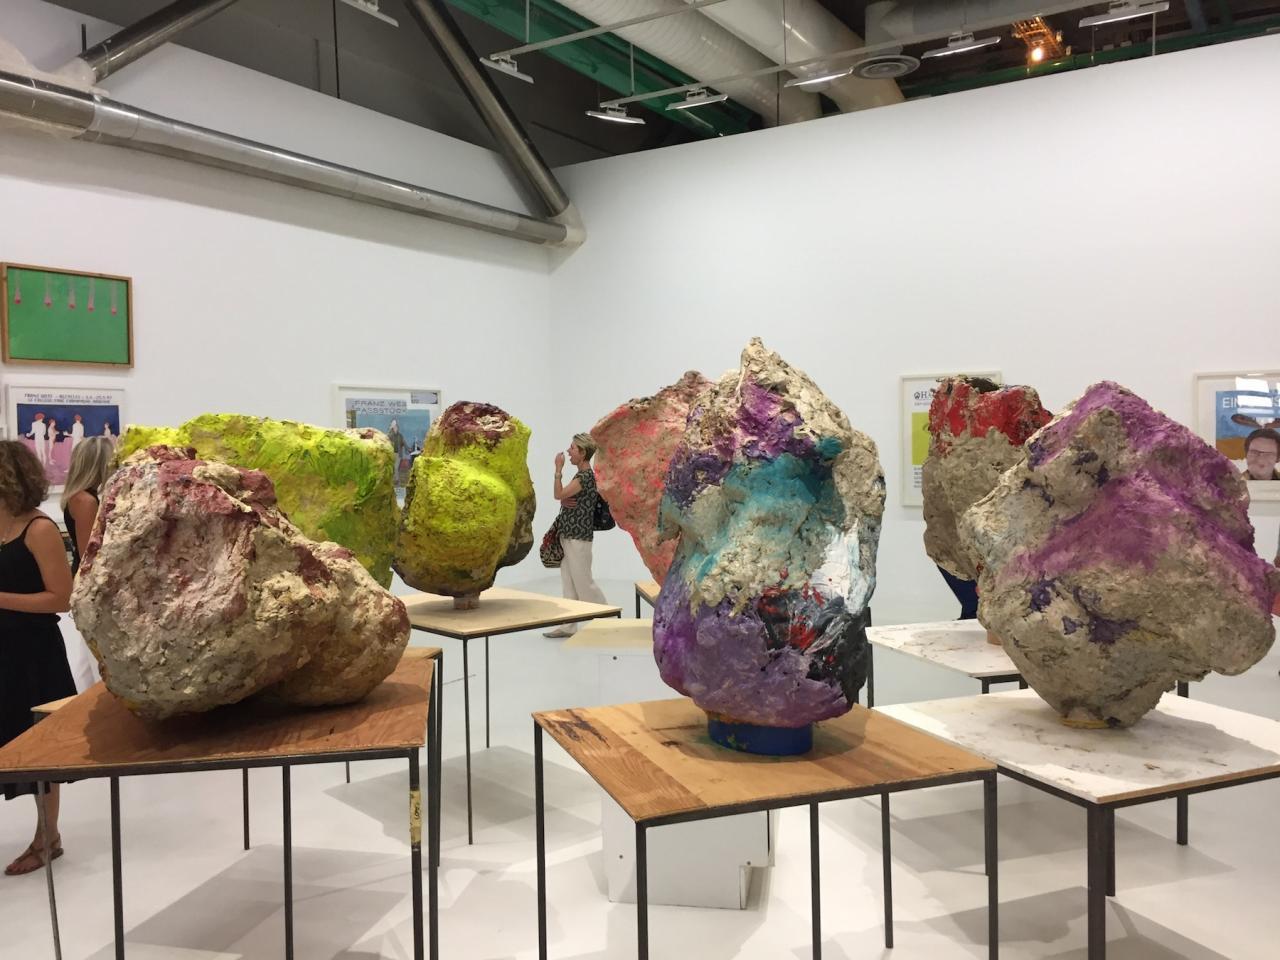 Franz West Gruppe mit Kabinett (Group with Cabinet, 2001),papier-mâché, gauze, tables, set of eight sculptures, dimensions variable